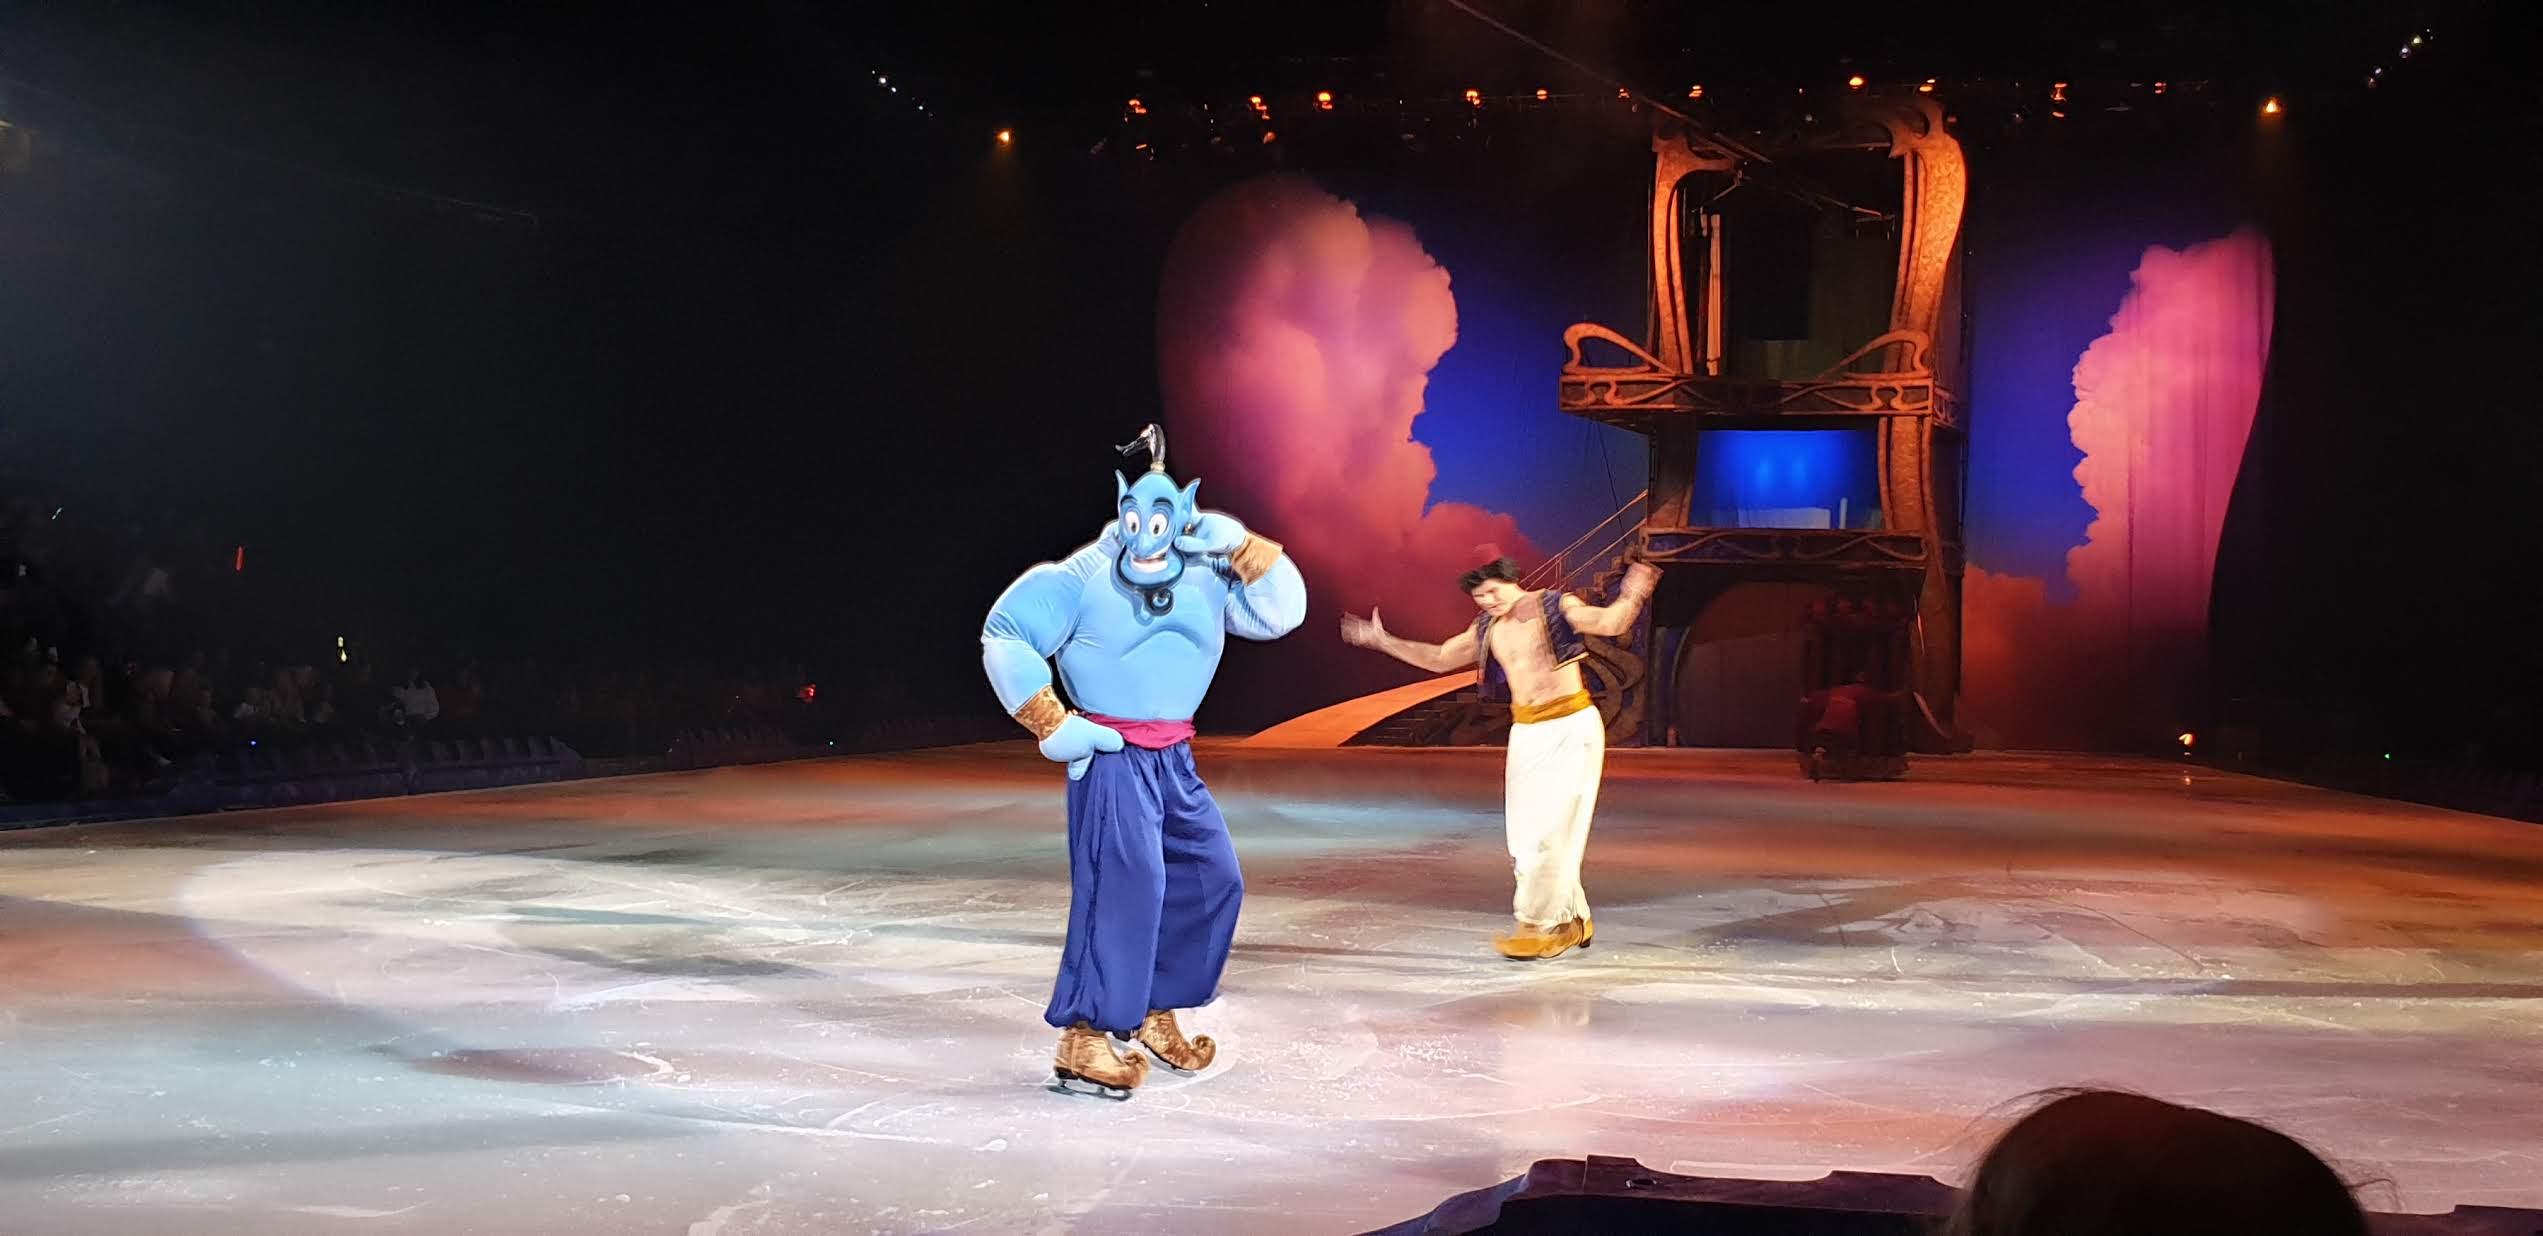 Aladdin and The Genie on ice